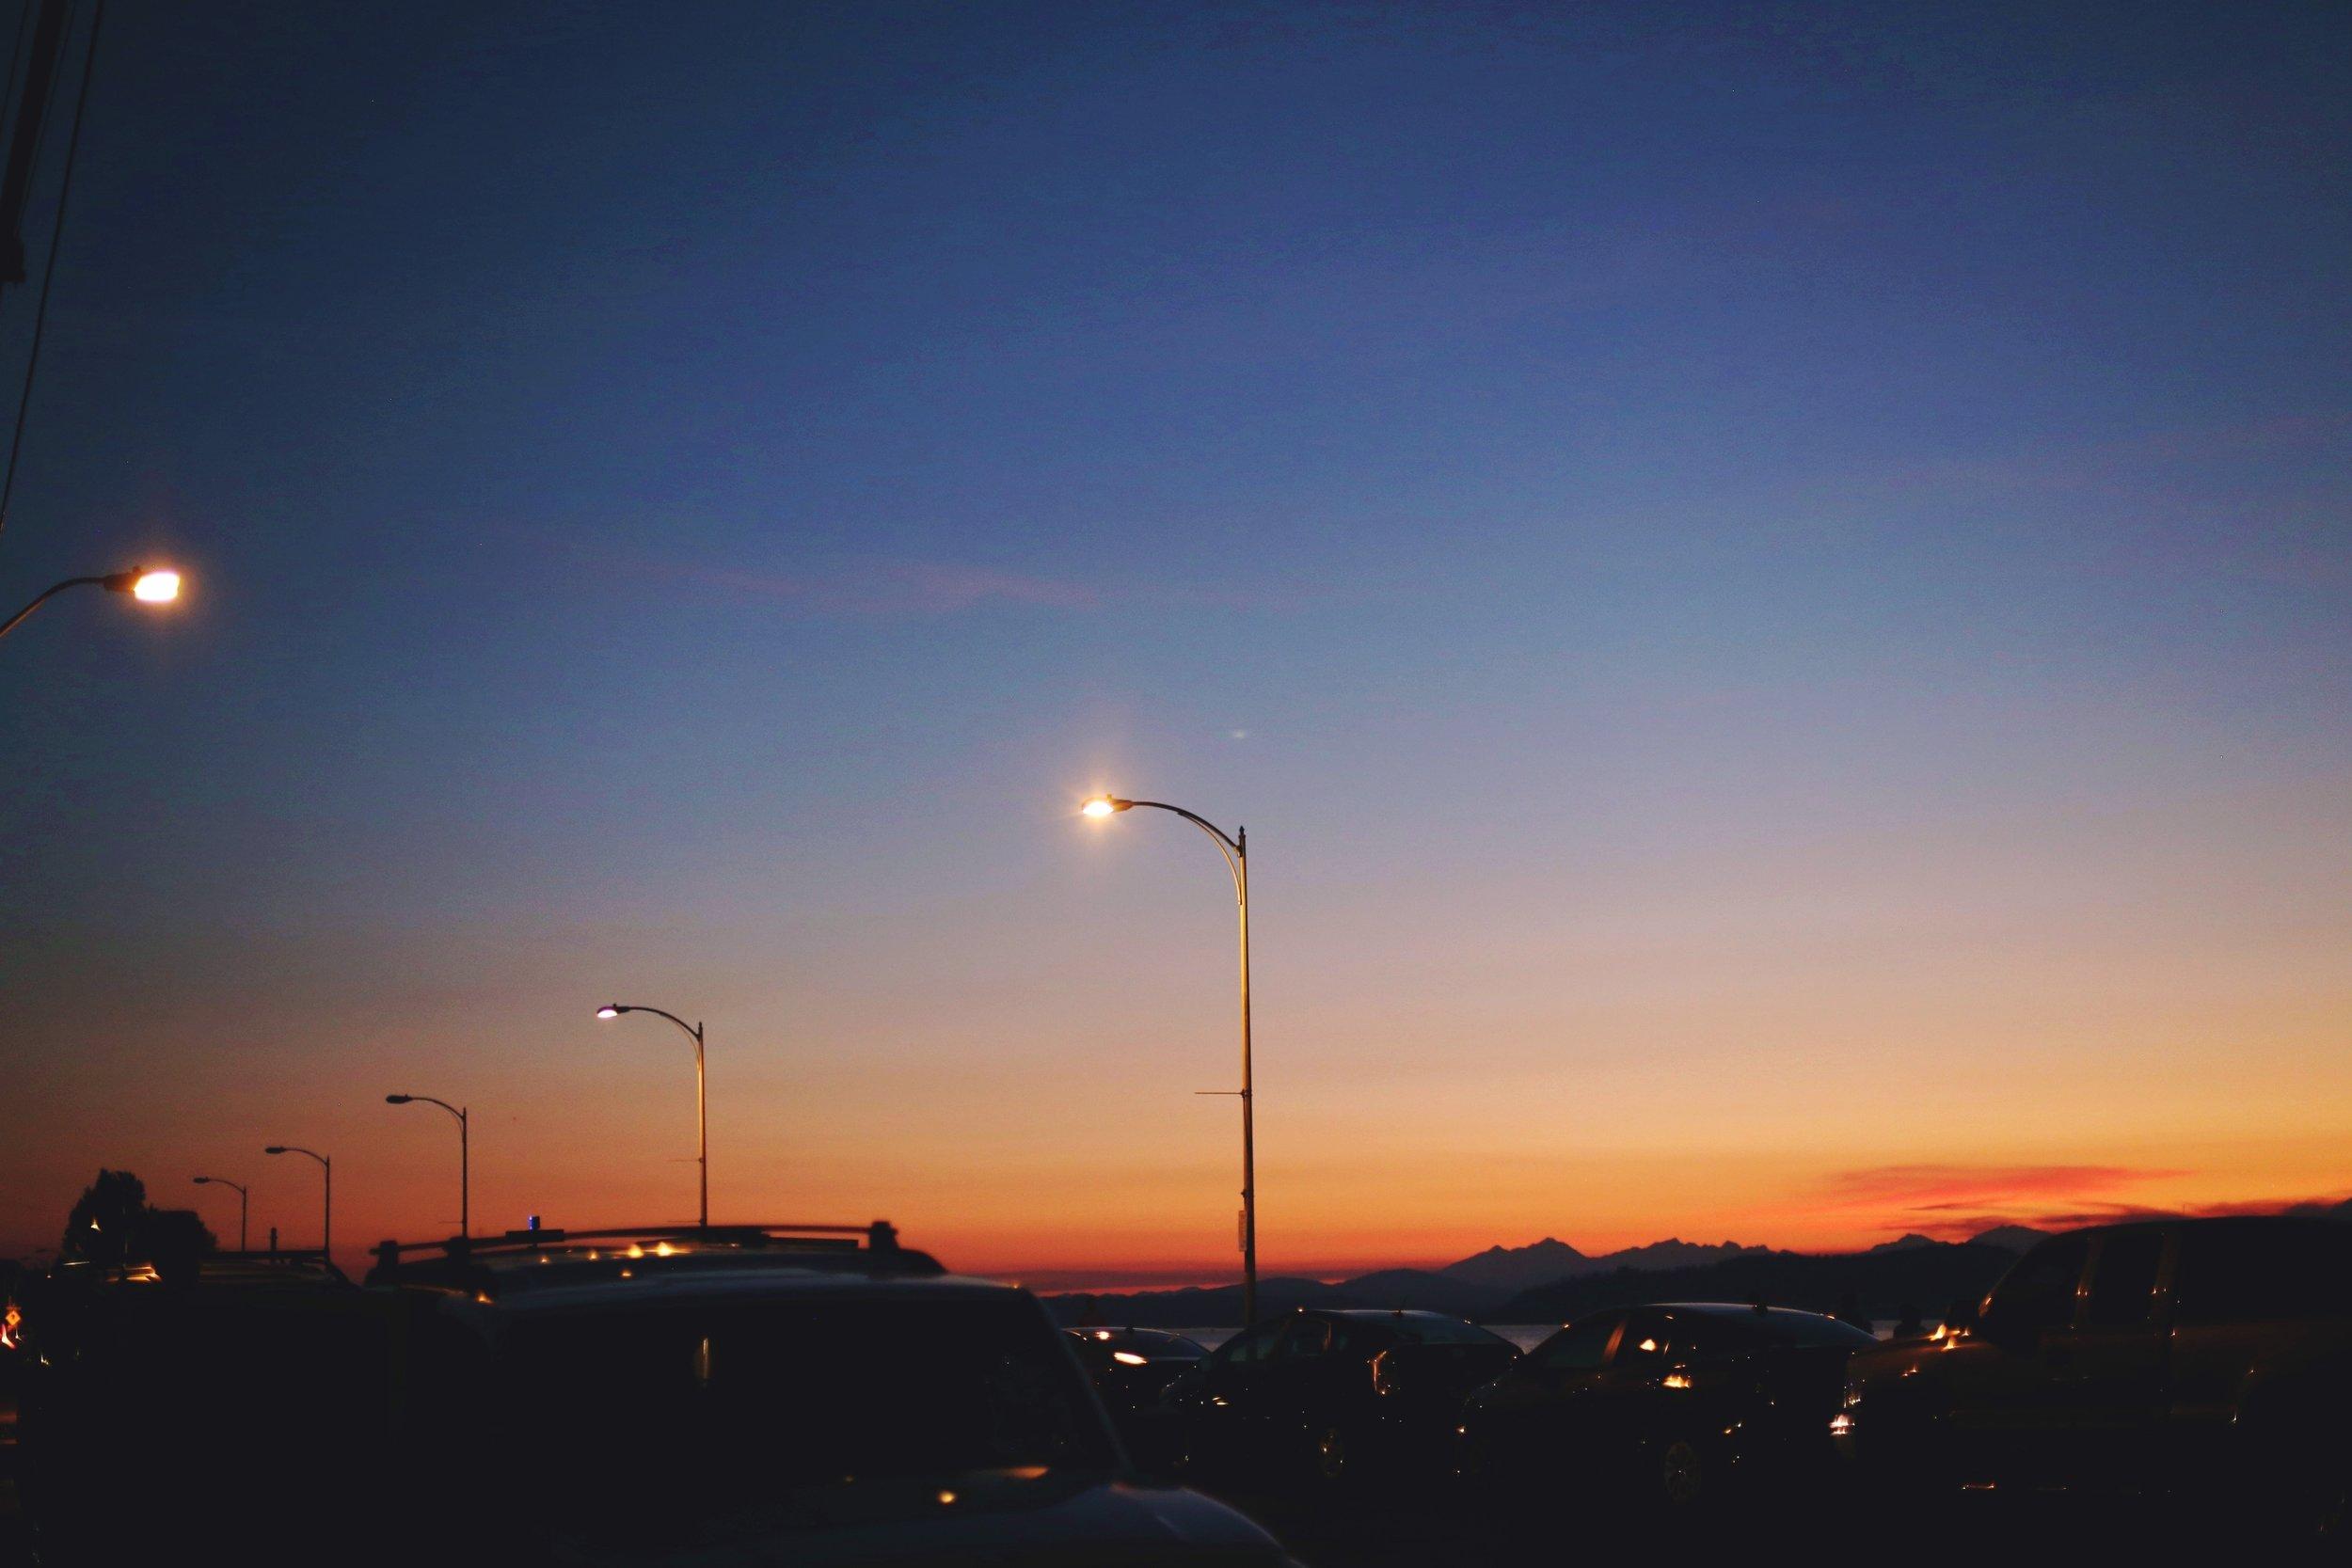 Alki Beach_Sunset_Summer_Seattle Fashion Blogger from Japan_Aikas Love Closet_Orange sky